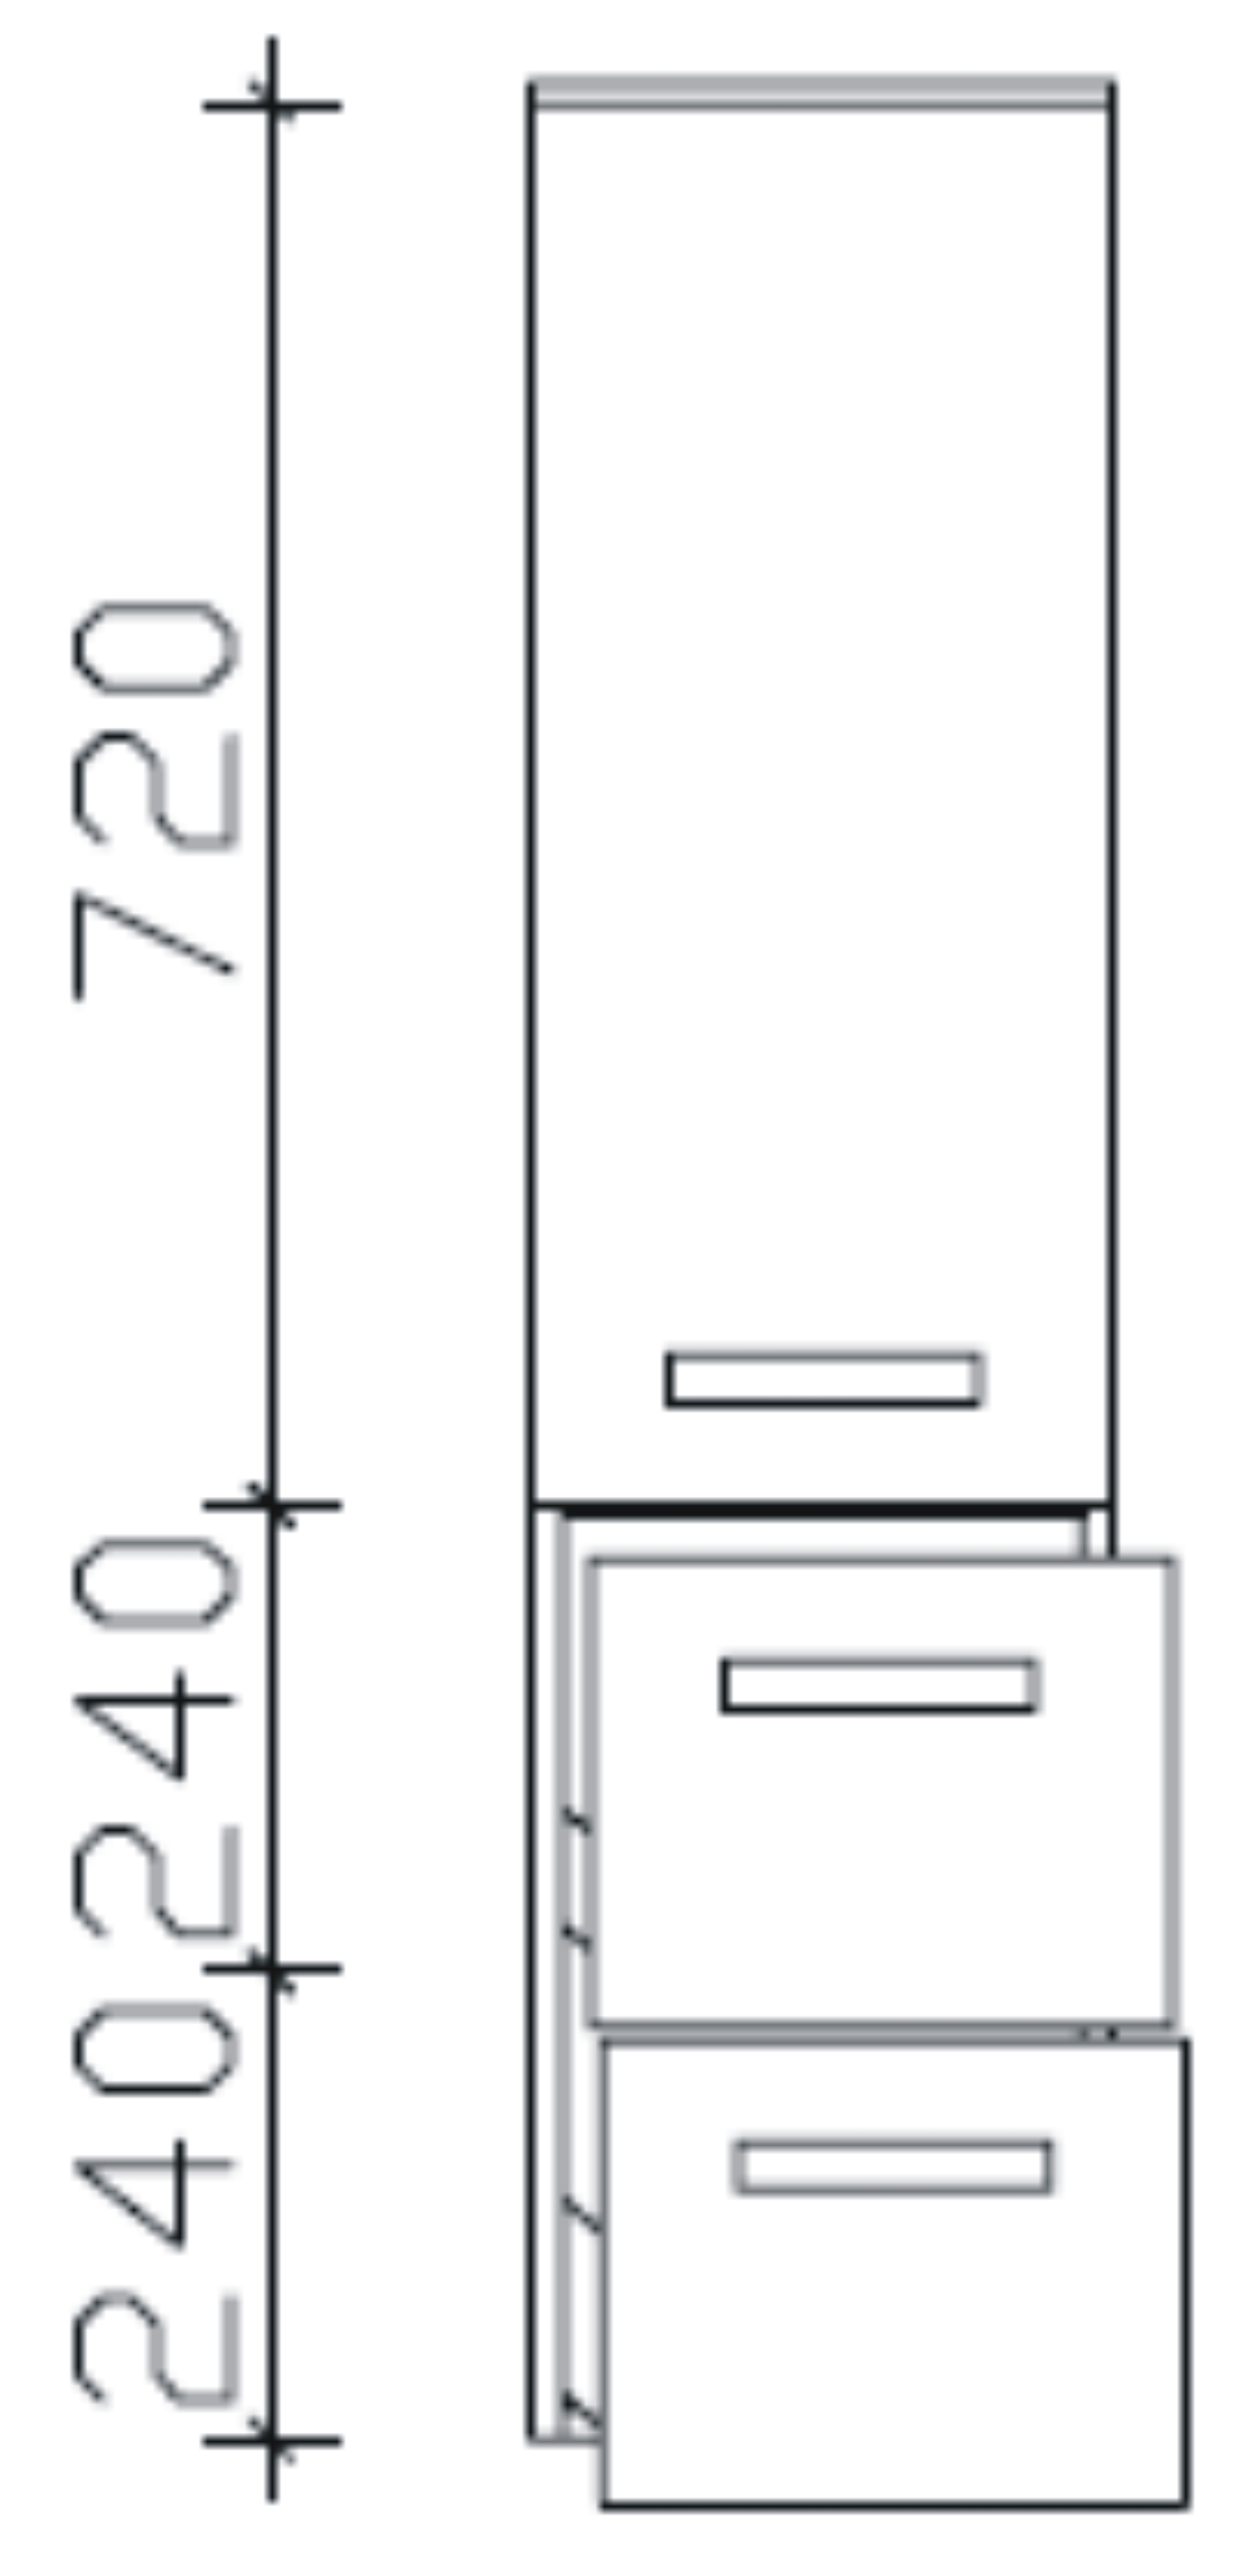 midischrank fokus 4005 badschrank g nstig arcom center. Black Bedroom Furniture Sets. Home Design Ideas